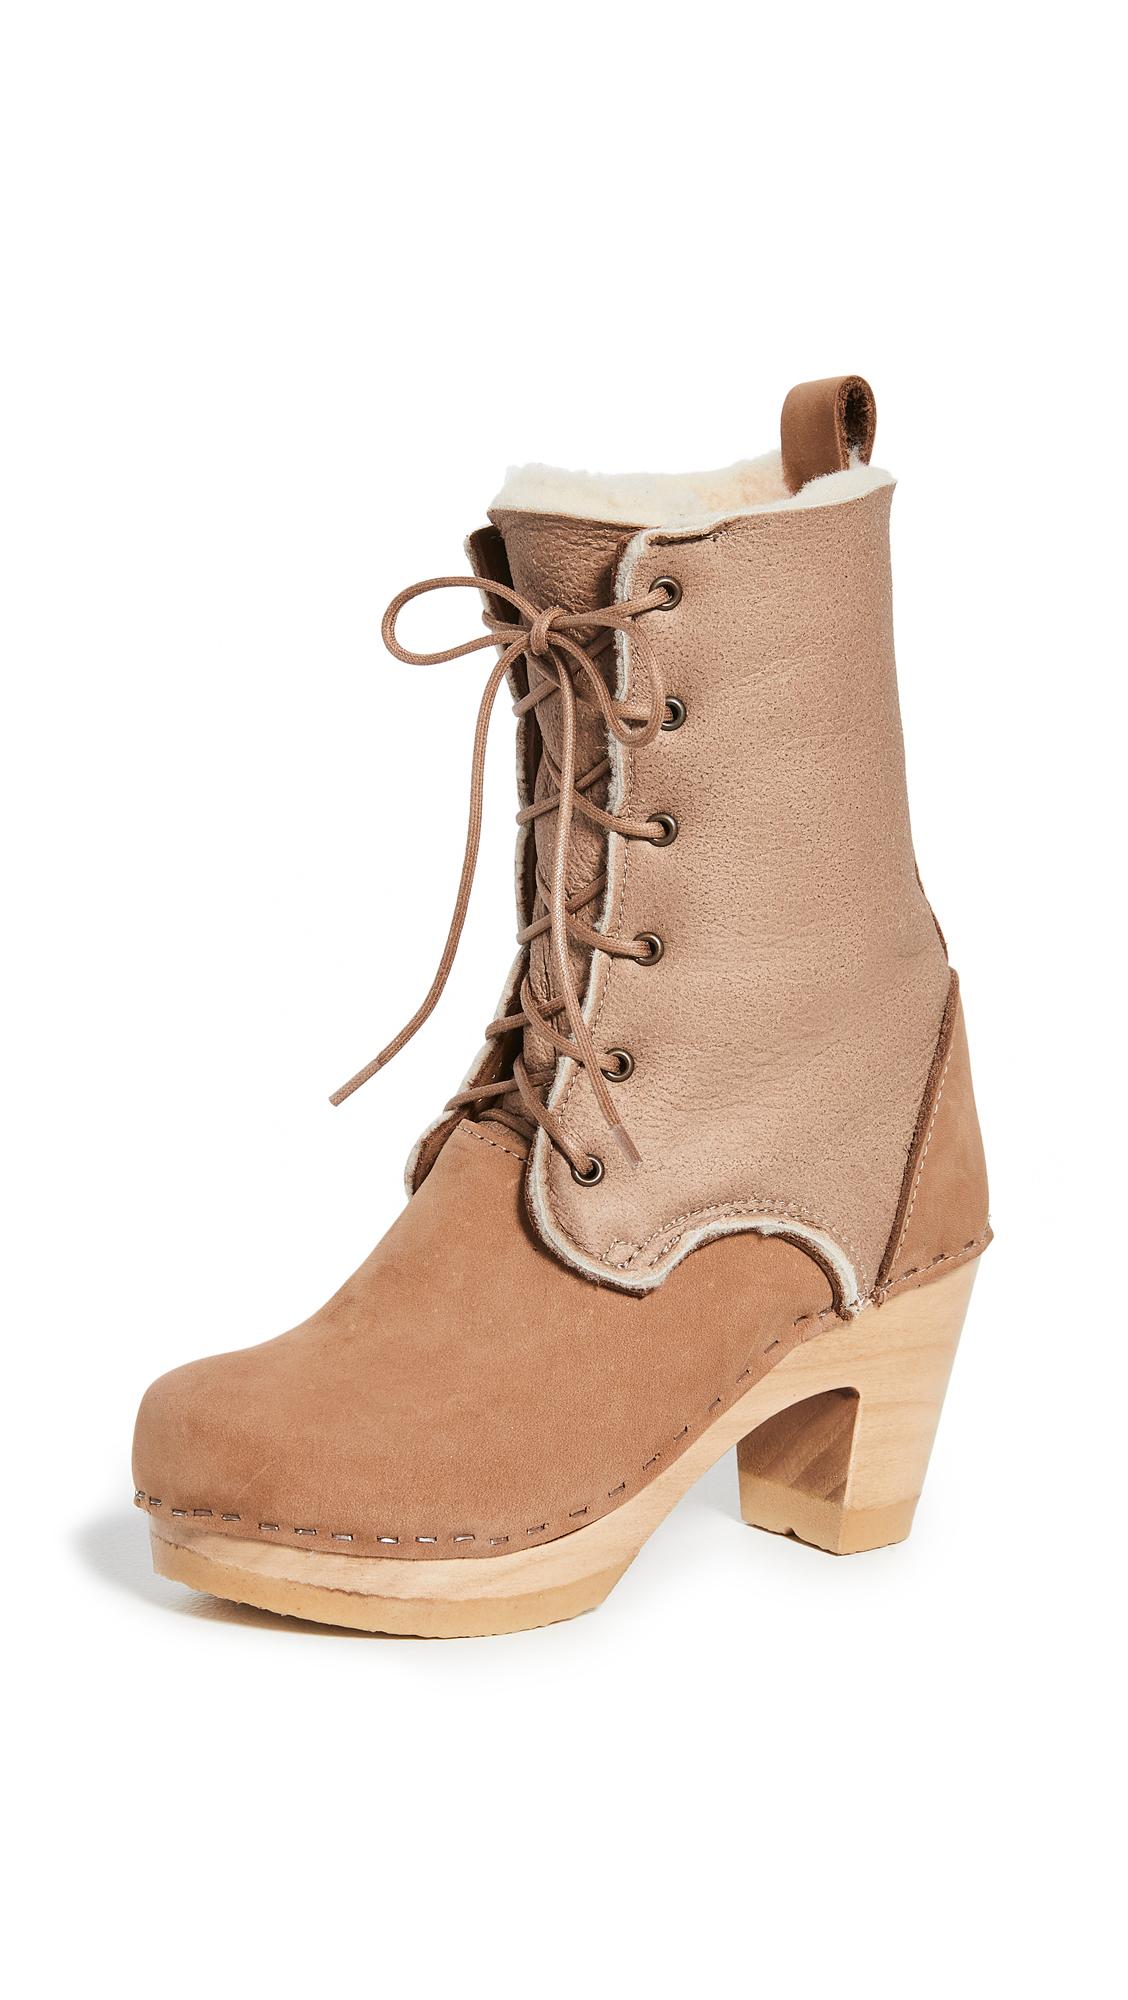 No.6 Fox Lace High Heel Shearling Boots